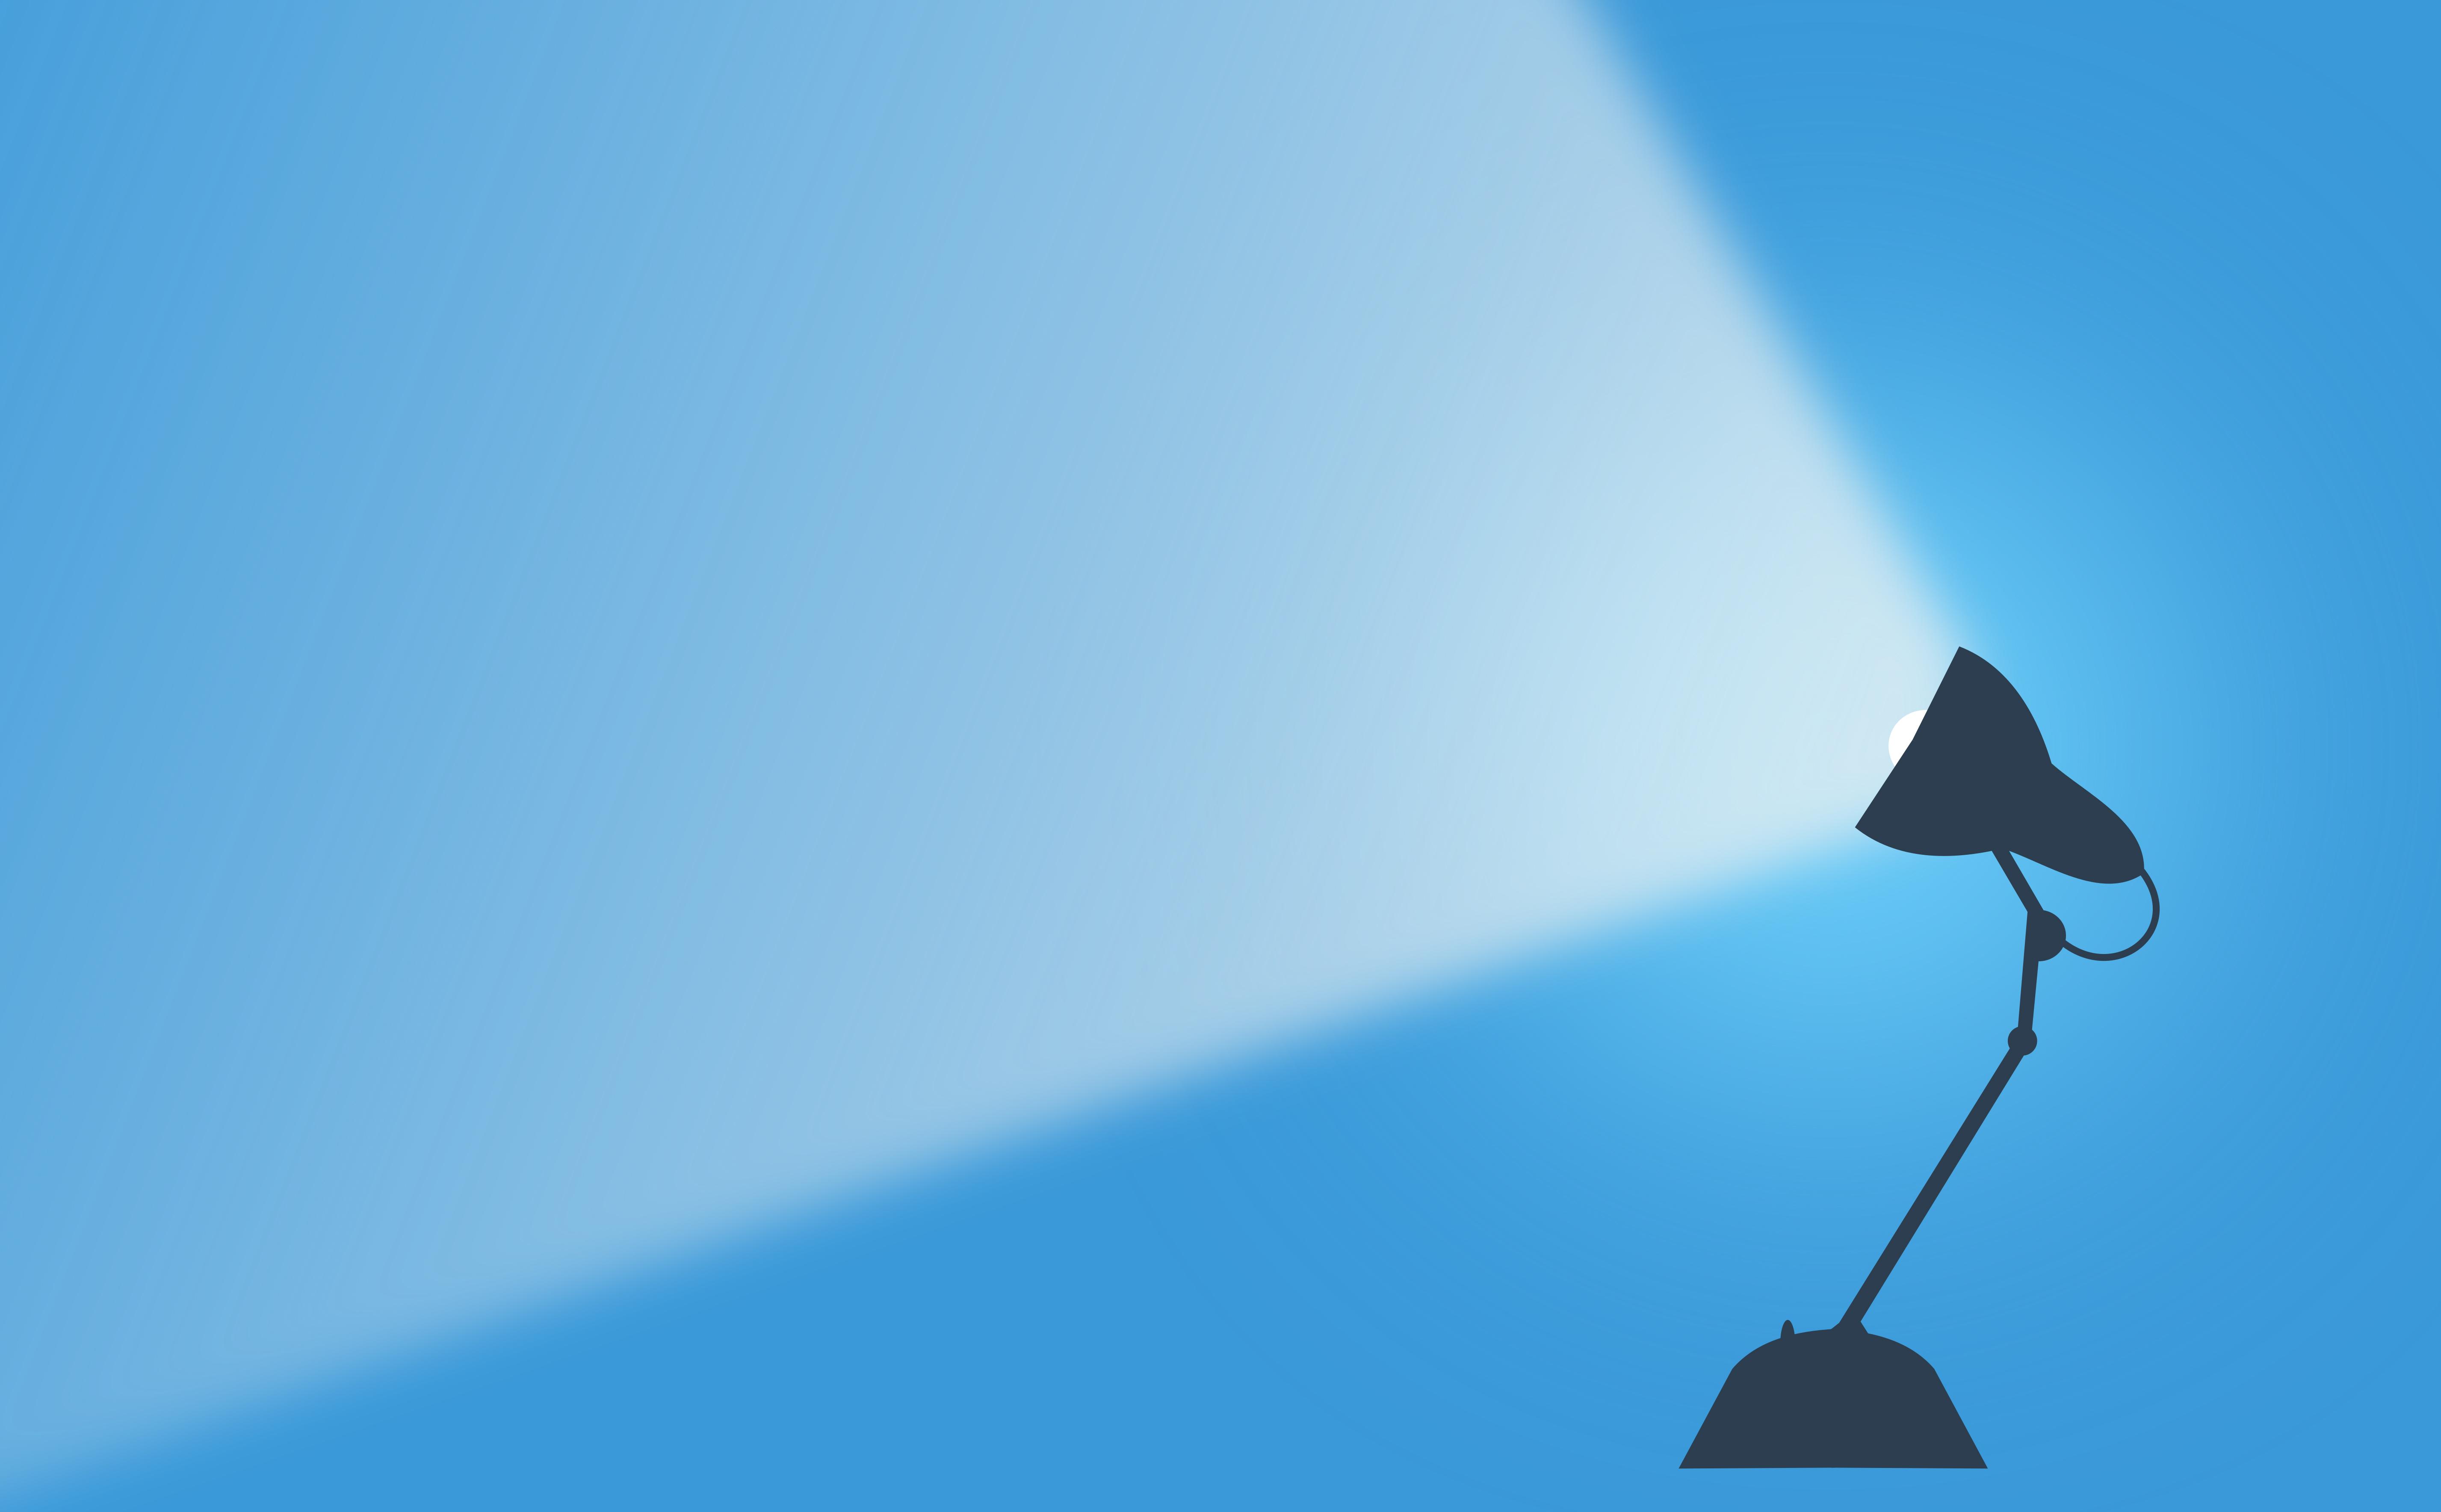 Desk Lamp Casting Light - Background With Copyspace, Casting, Concept, Copyspace, Dark, HQ Photo